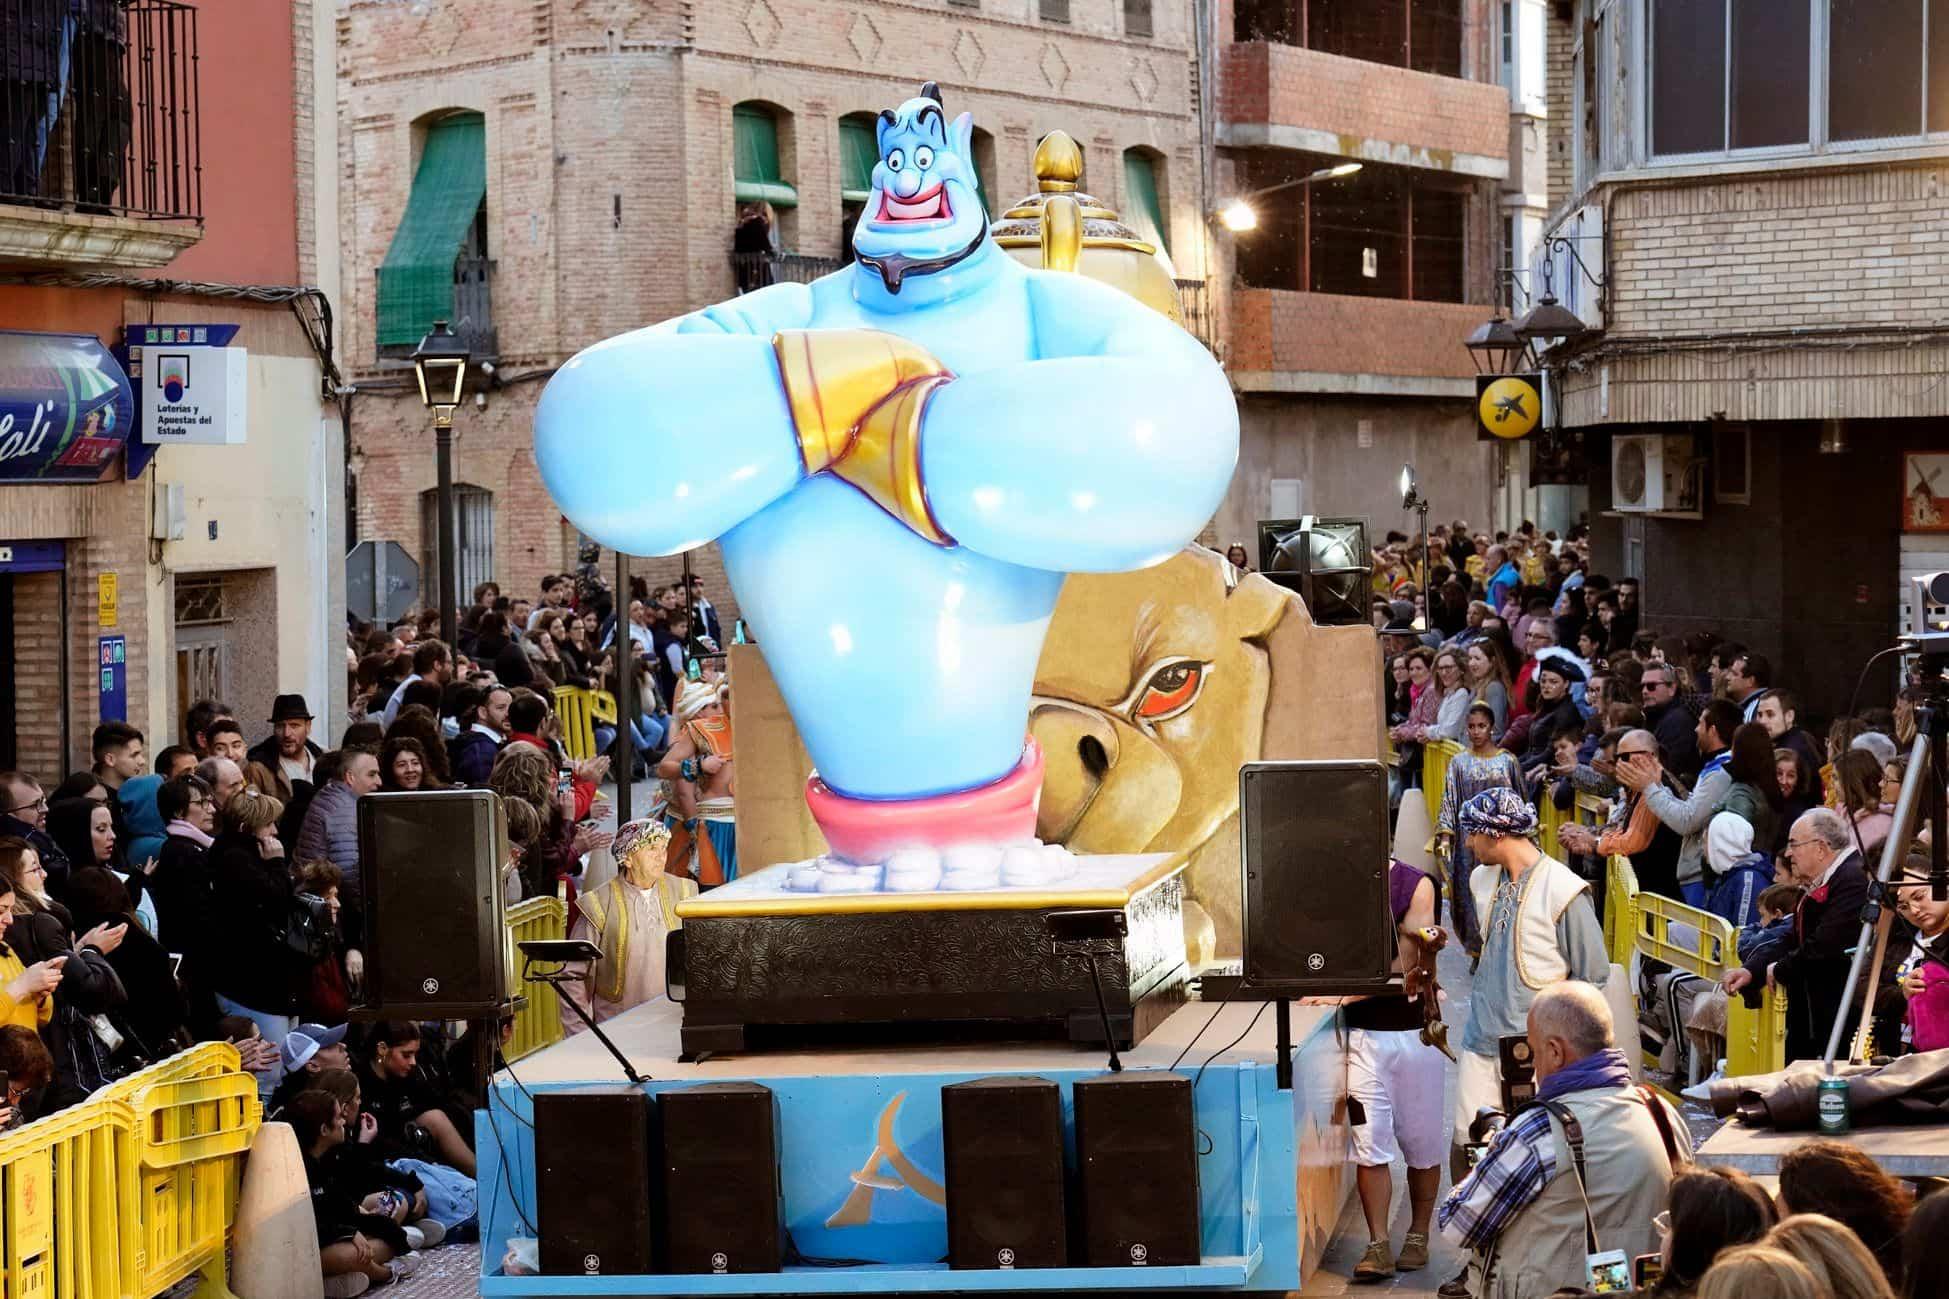 Carnaval de herencia 2020 ofertorio 147 - Selección de fotografías del Ofertorio del Carnaval de Herencia